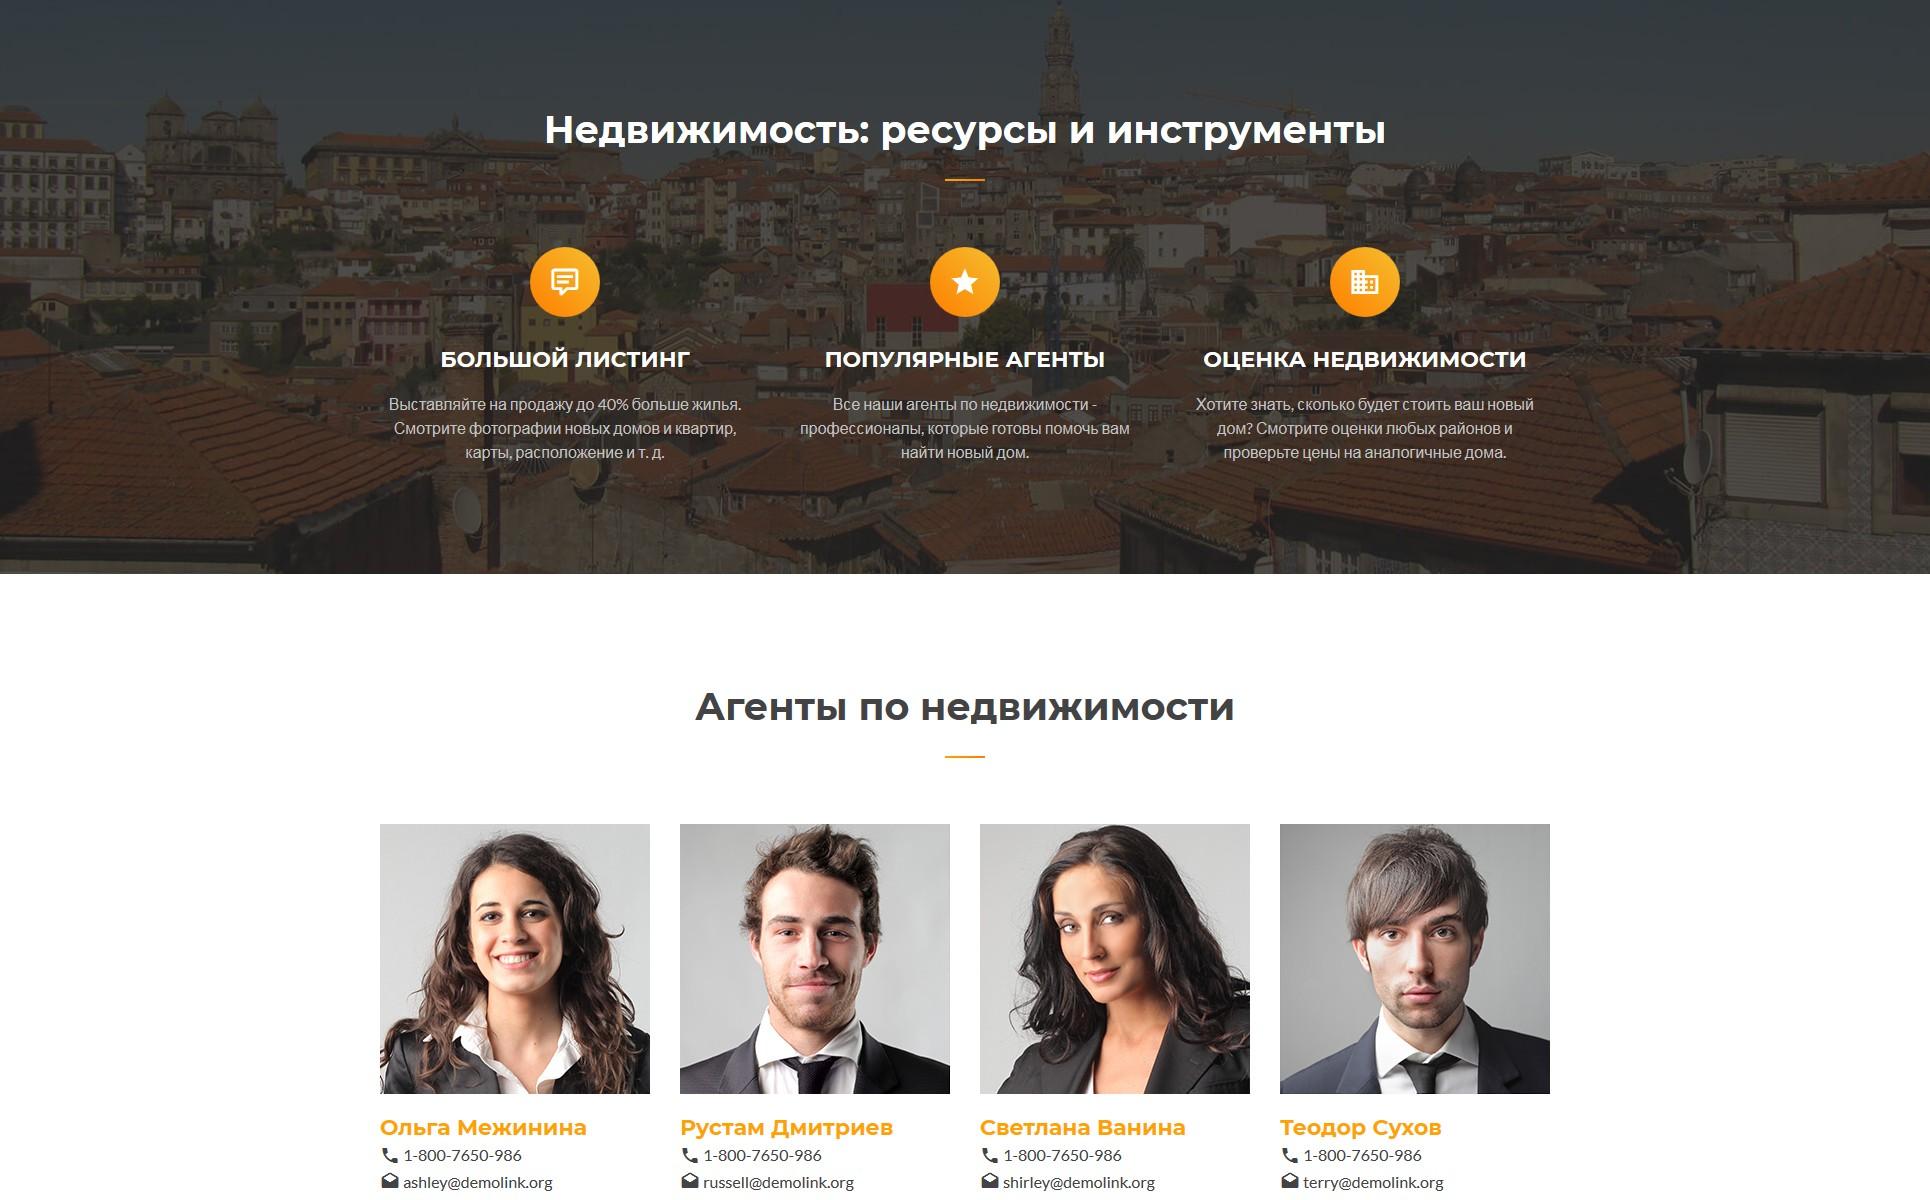 https://s3u.tmimgcdn.com/1519369-1543504077081_Image-02.jpg